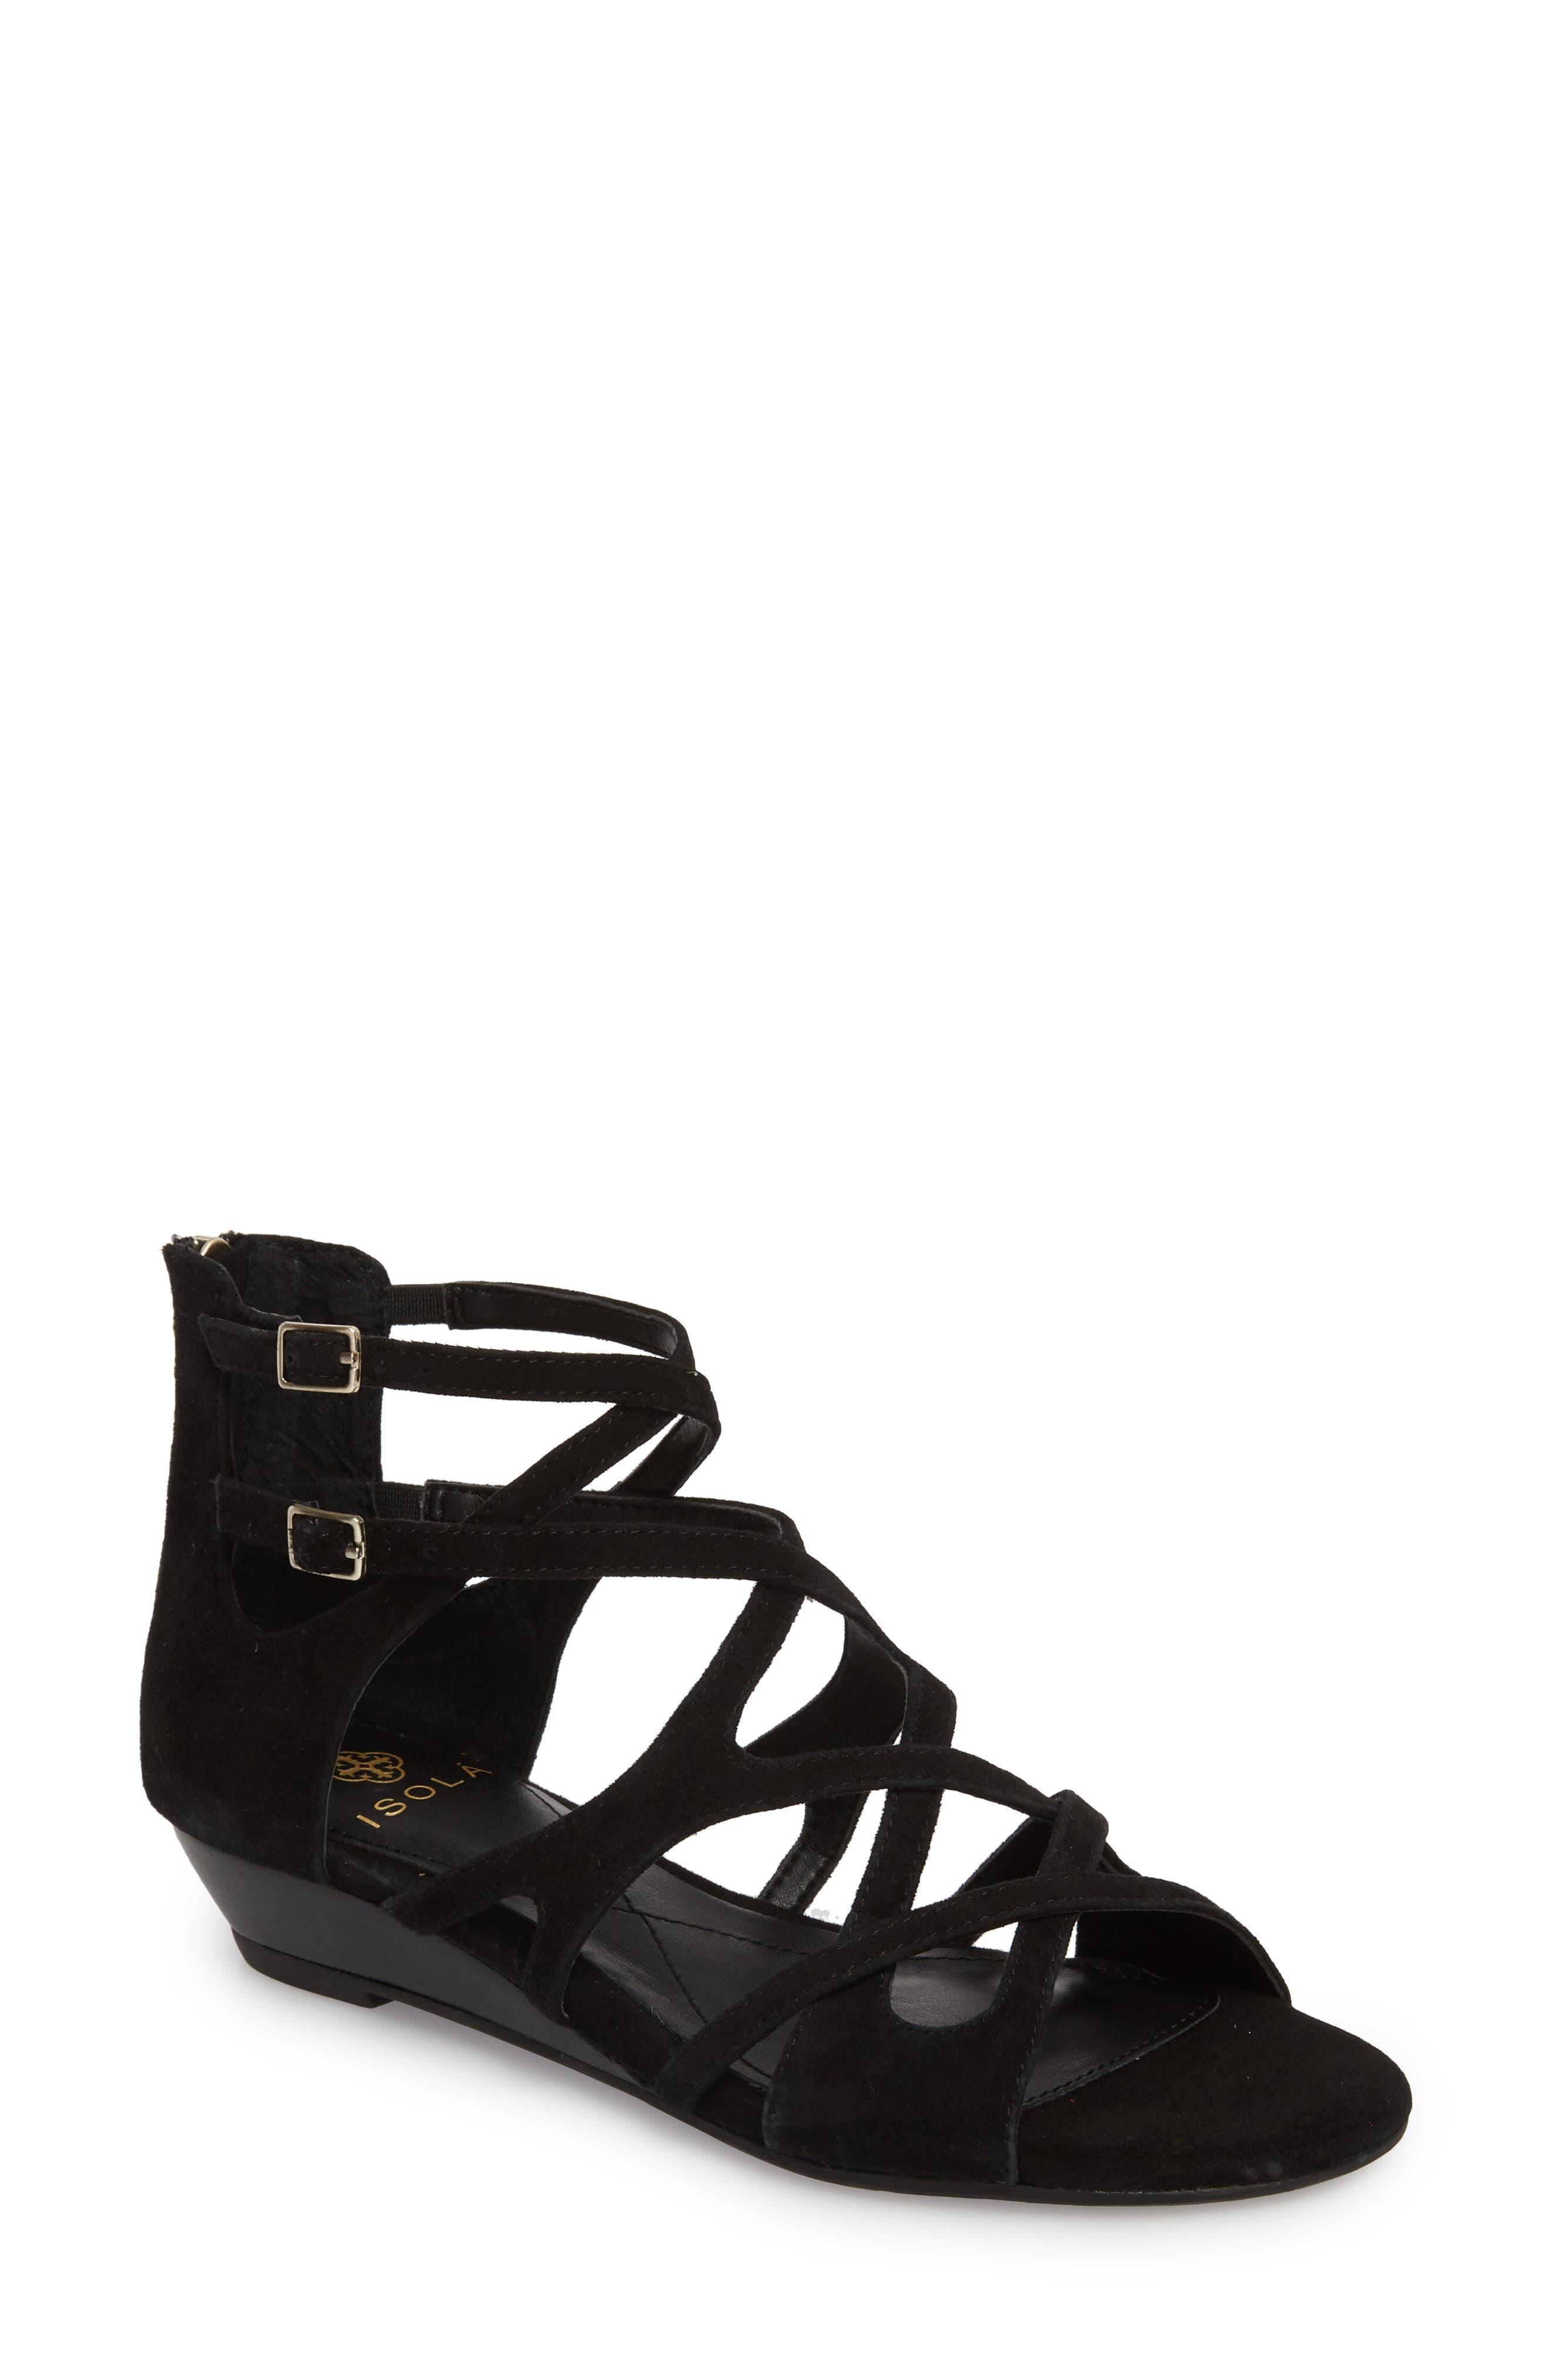 ISOLÁ Esmerilda Wedge Sandal, Main, color, BLACK SUEDE